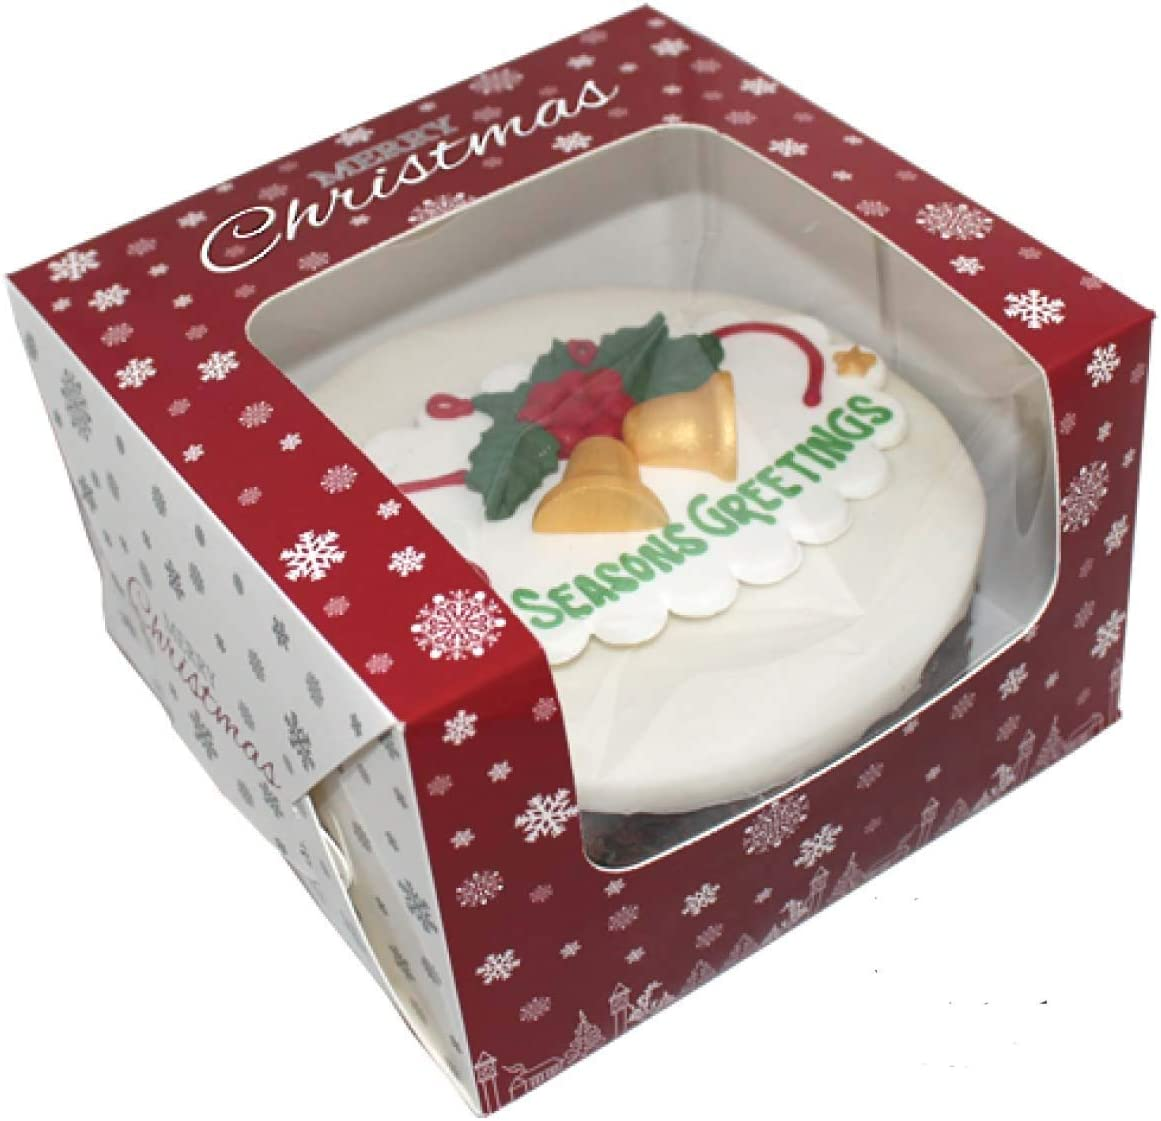 Pack of 10 Premium Windowed Christmas SNOWFLAKE Cake Boxes 8 x 8 x 5